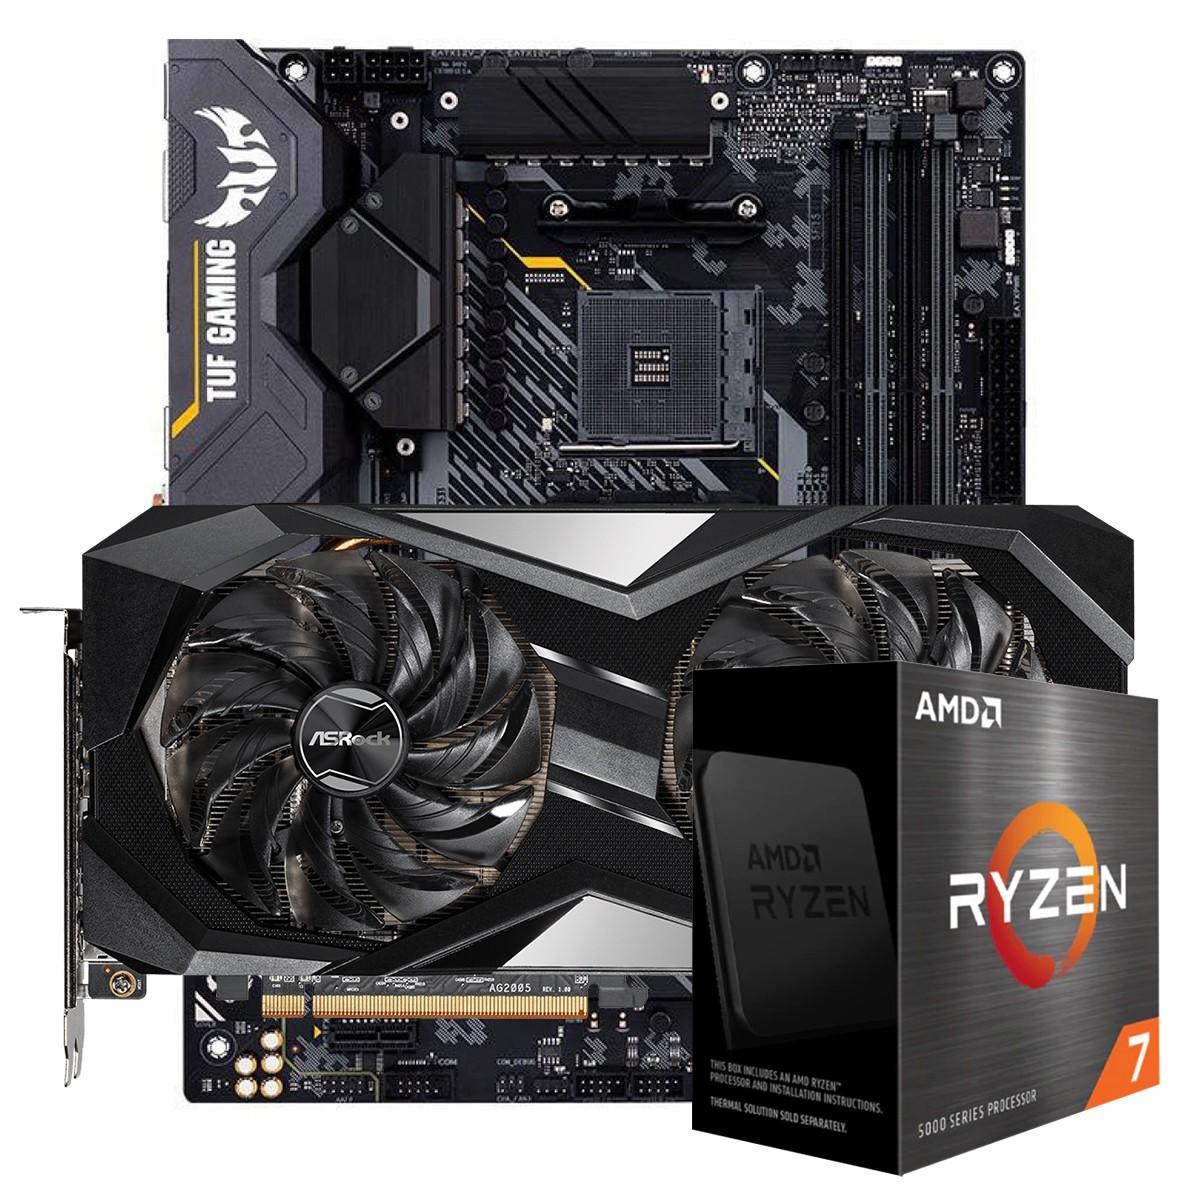 Kit Upgrade ASRock Radeon RX 6700 XT Challenger + AMD Ryzen 7 5800X + ASUS TUF Gaming X570-Plus